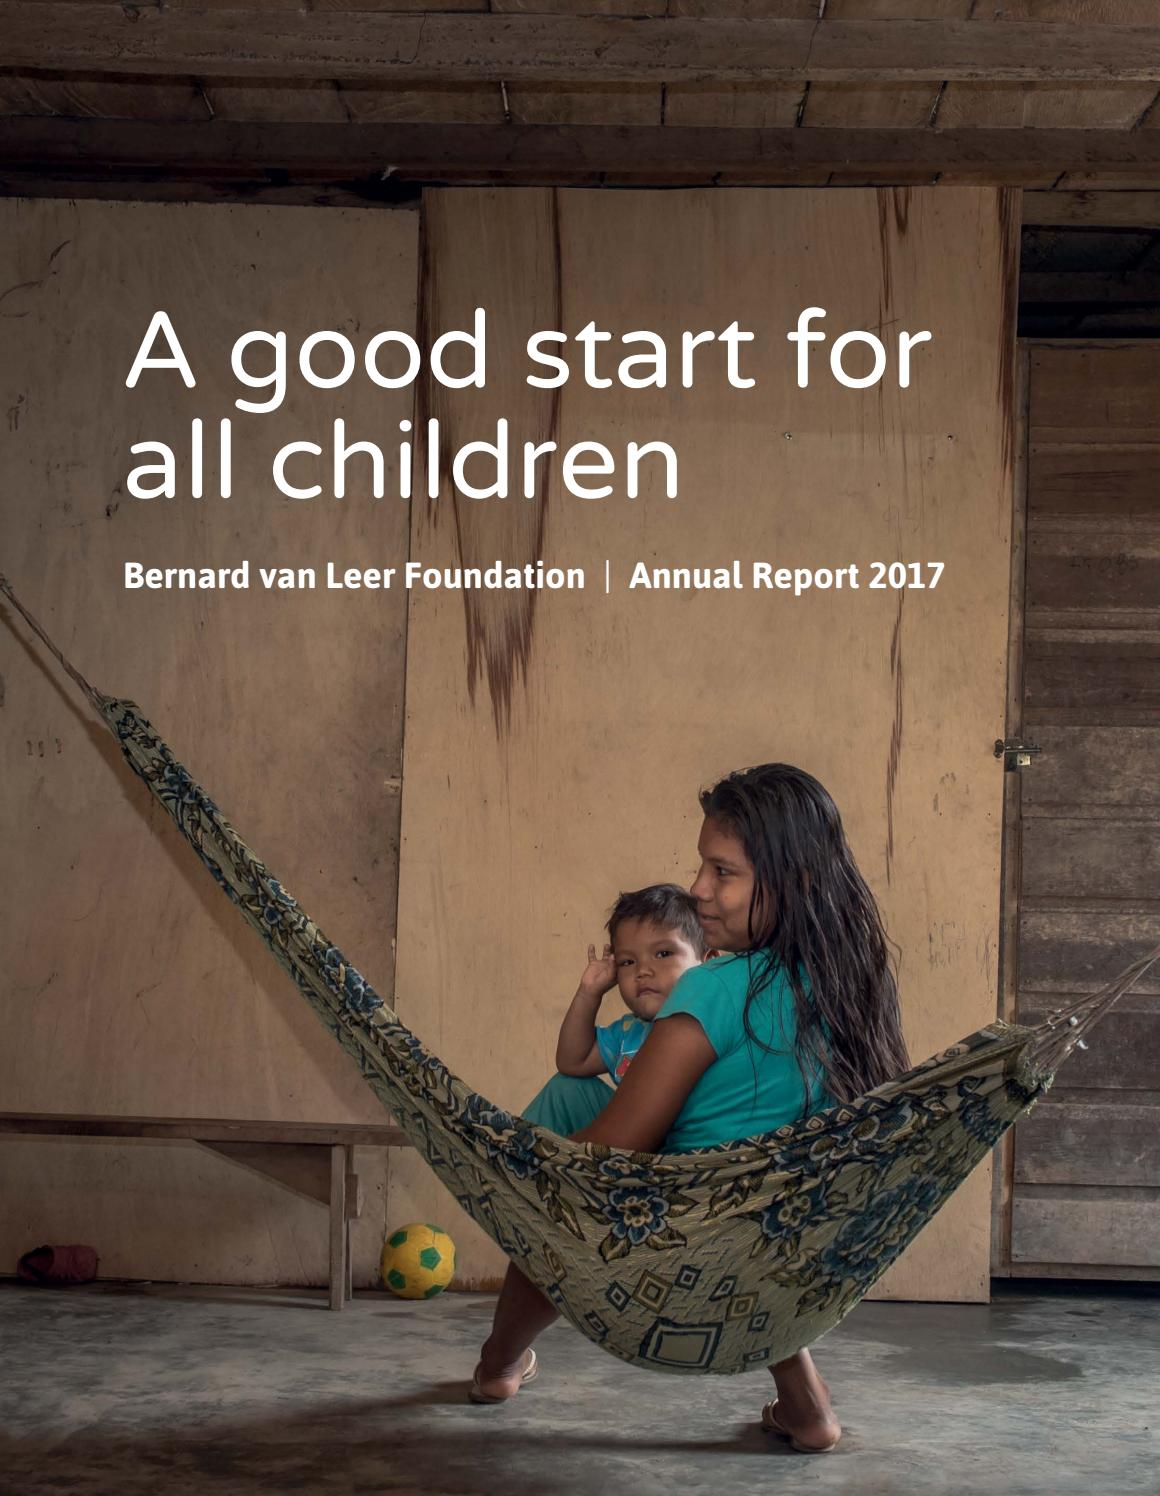 Amables Antes La Vecina annual report 2017bernard van leer foundation - issuu